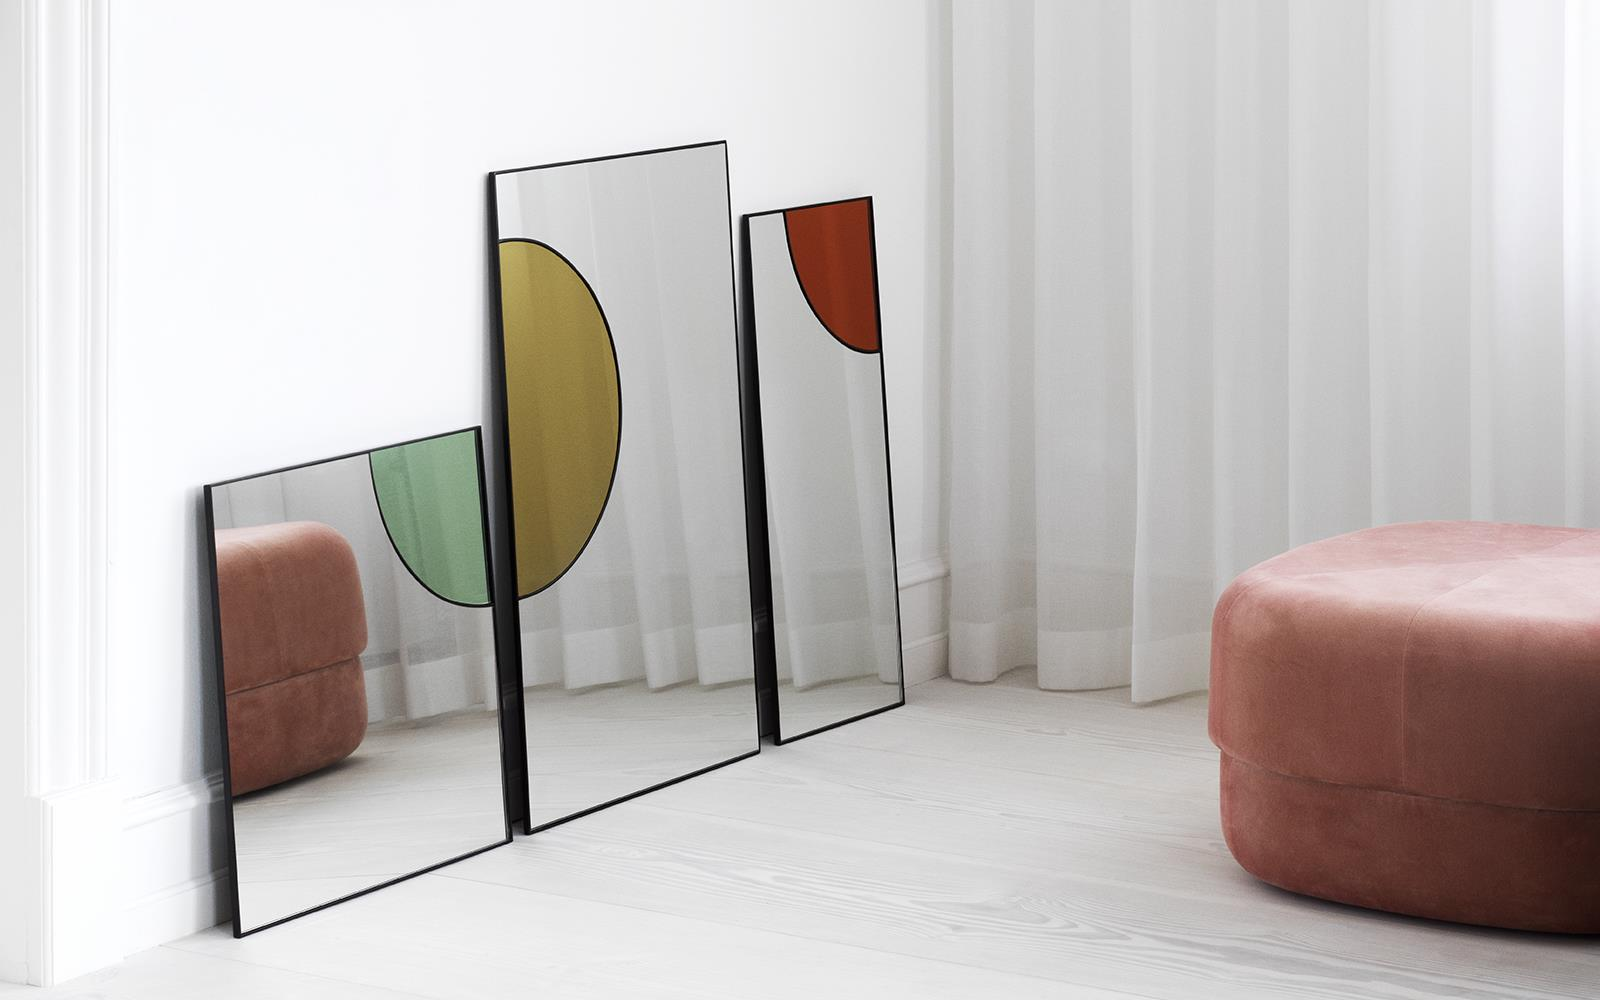 normann cph mirrors.png